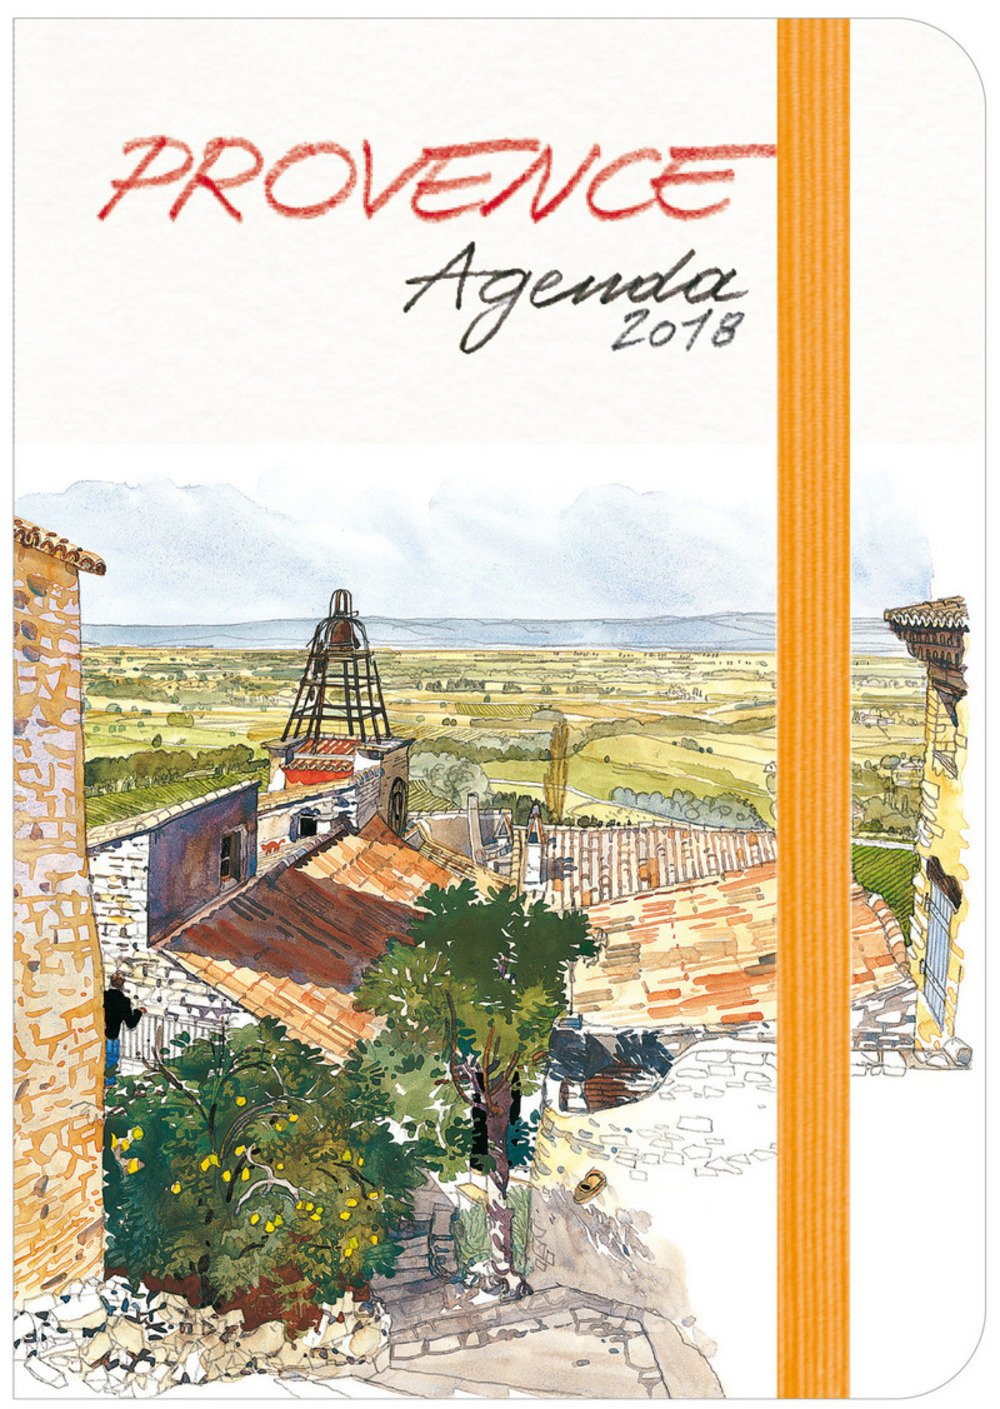 Agenda Provence: 9782878682120: Amazon.com: Books